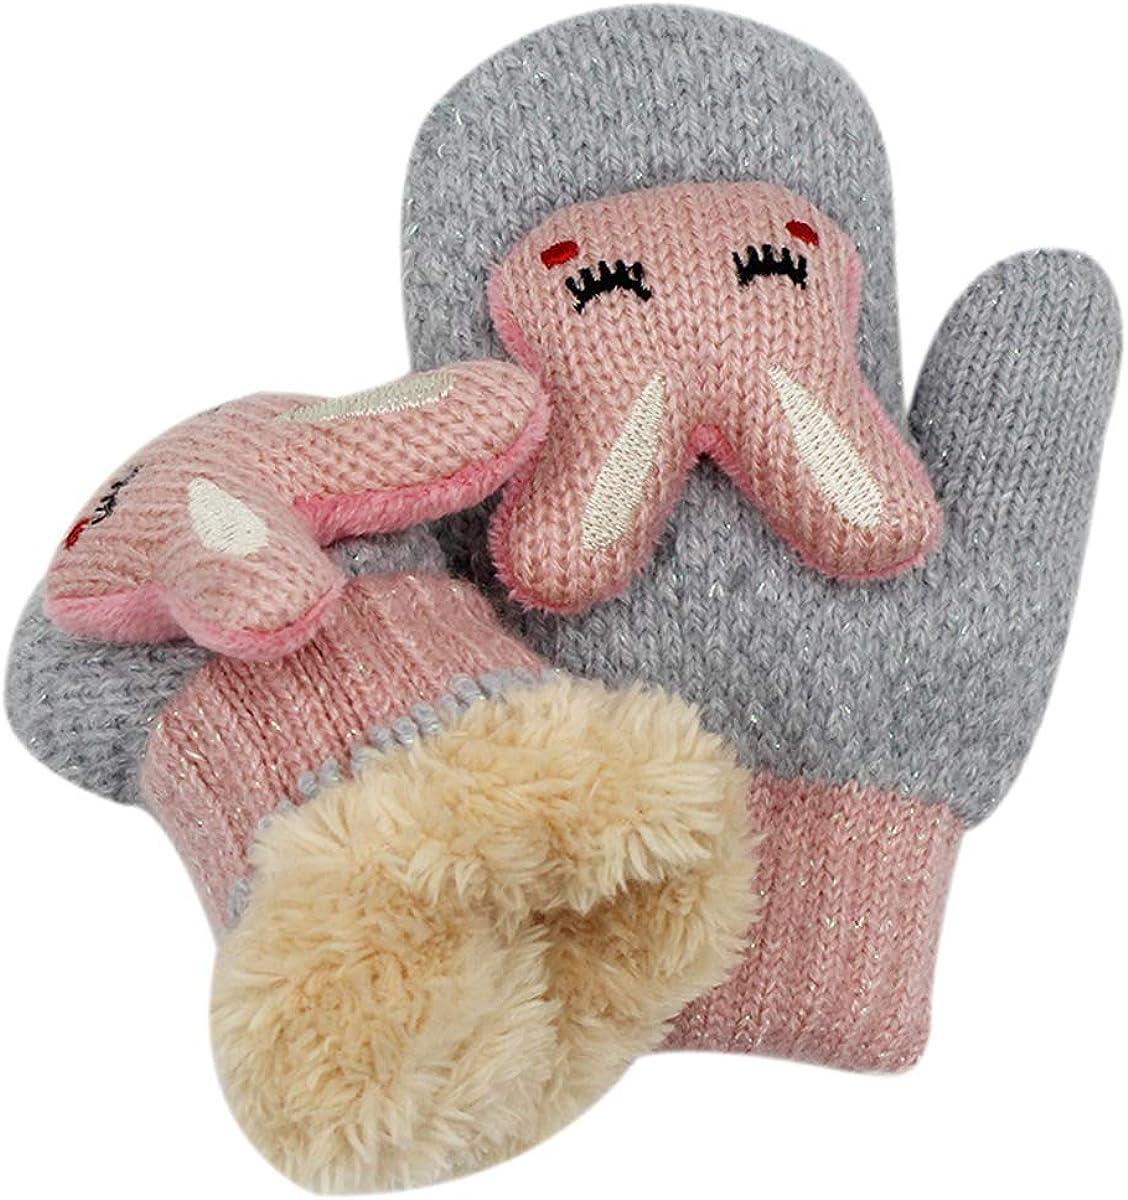 RARITY-US 0-5Y Unisex Knit Cute 3D Cartoon Bunny Gloves Winter Warm Fingerless Half Finger Mittens for Kids Girls Boys